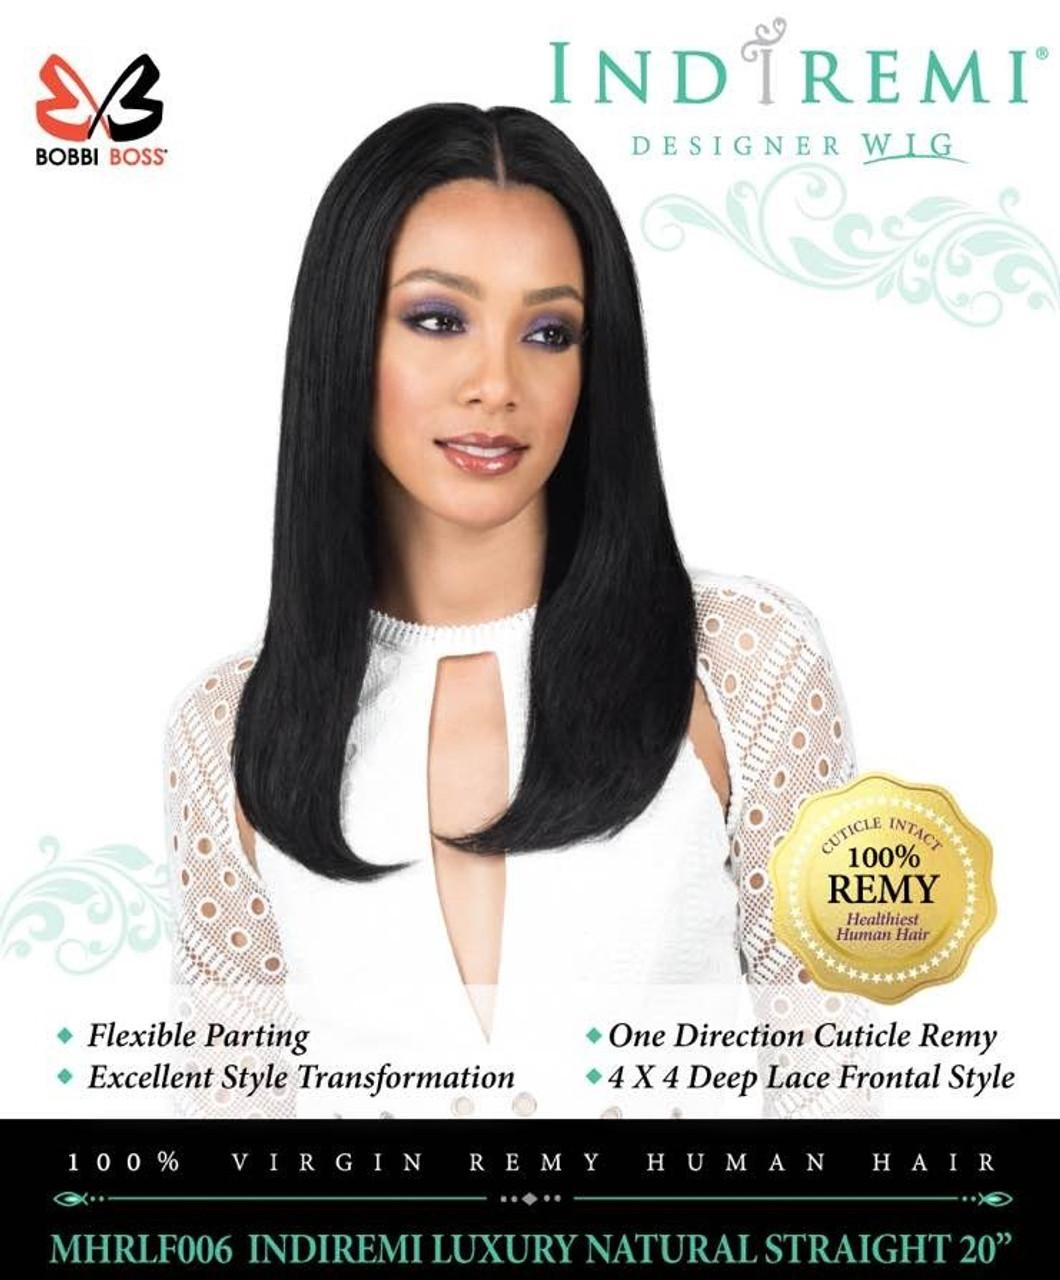 a1852efc3 Bobbi Boss INDI REMI 100% Remy Hair Designer Lace Wig Natural Straight